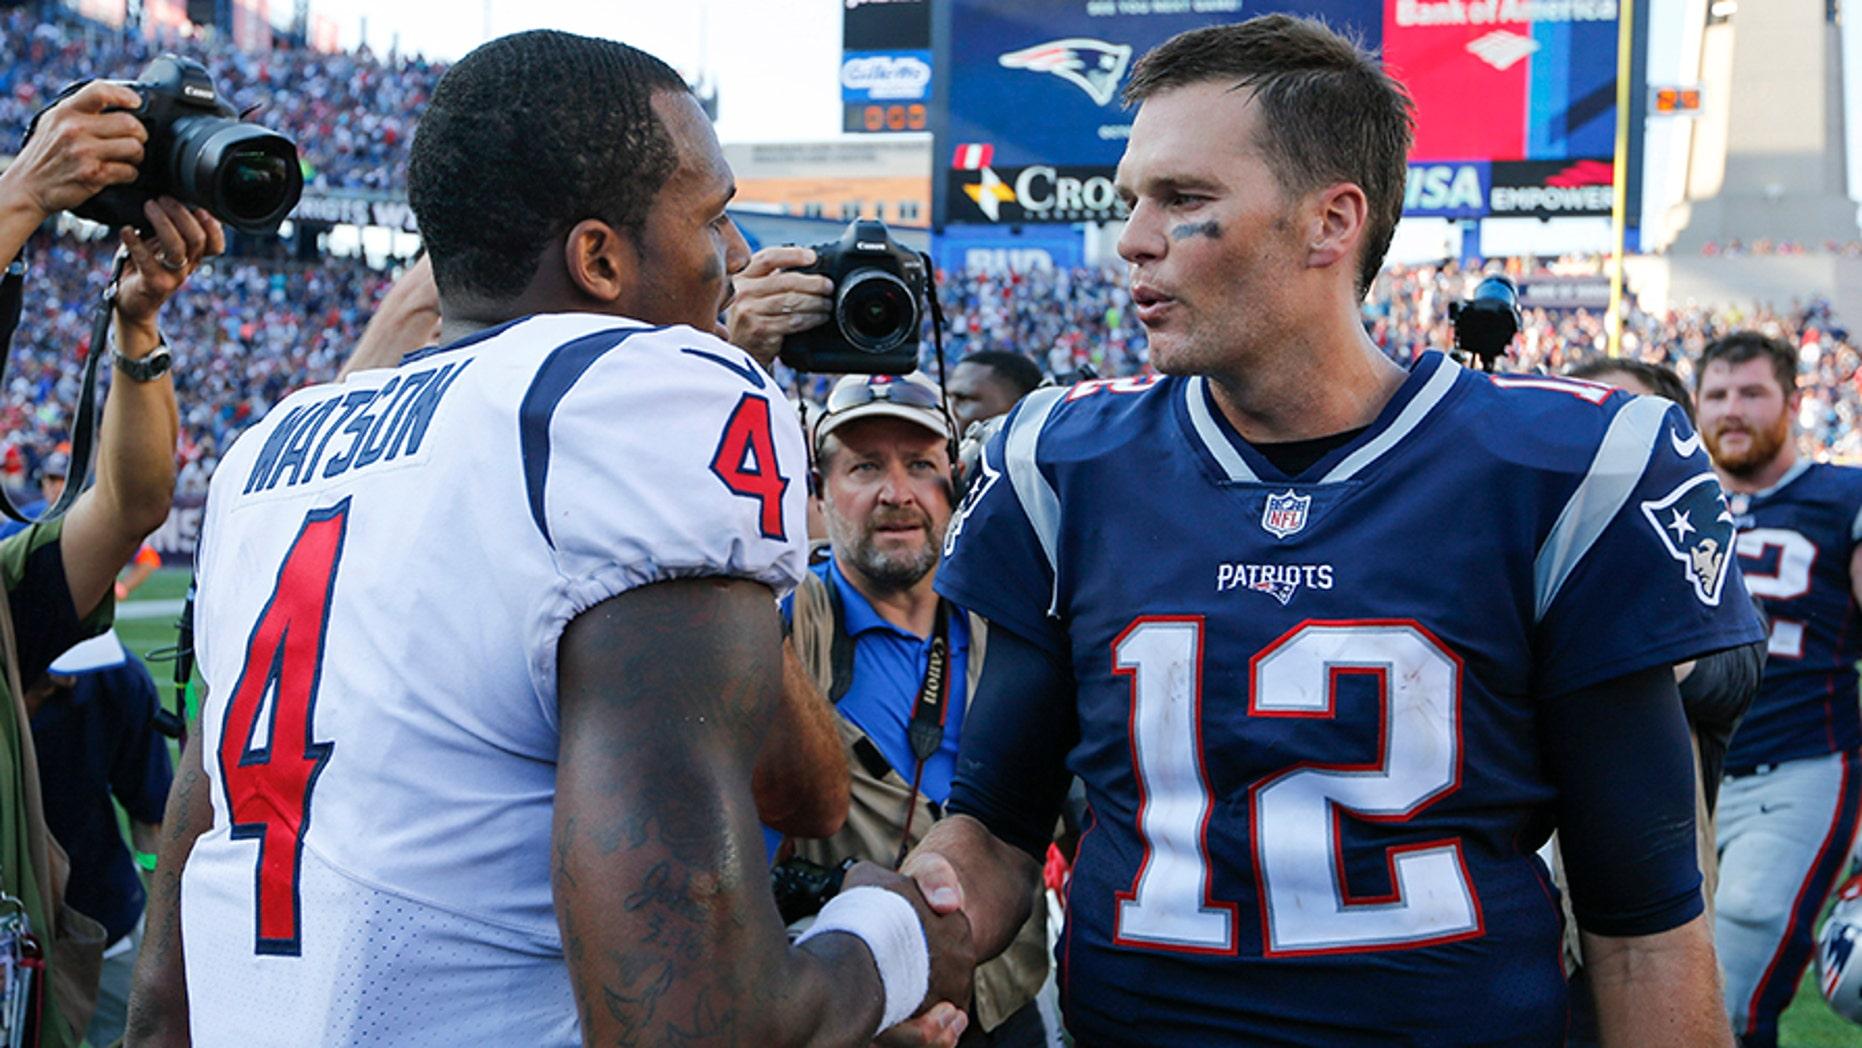 New England Patriots quarterback Tom Brady greets Houston Texans quarterback Deshaun Watson after their game in Foxborough, September 24, 2017.